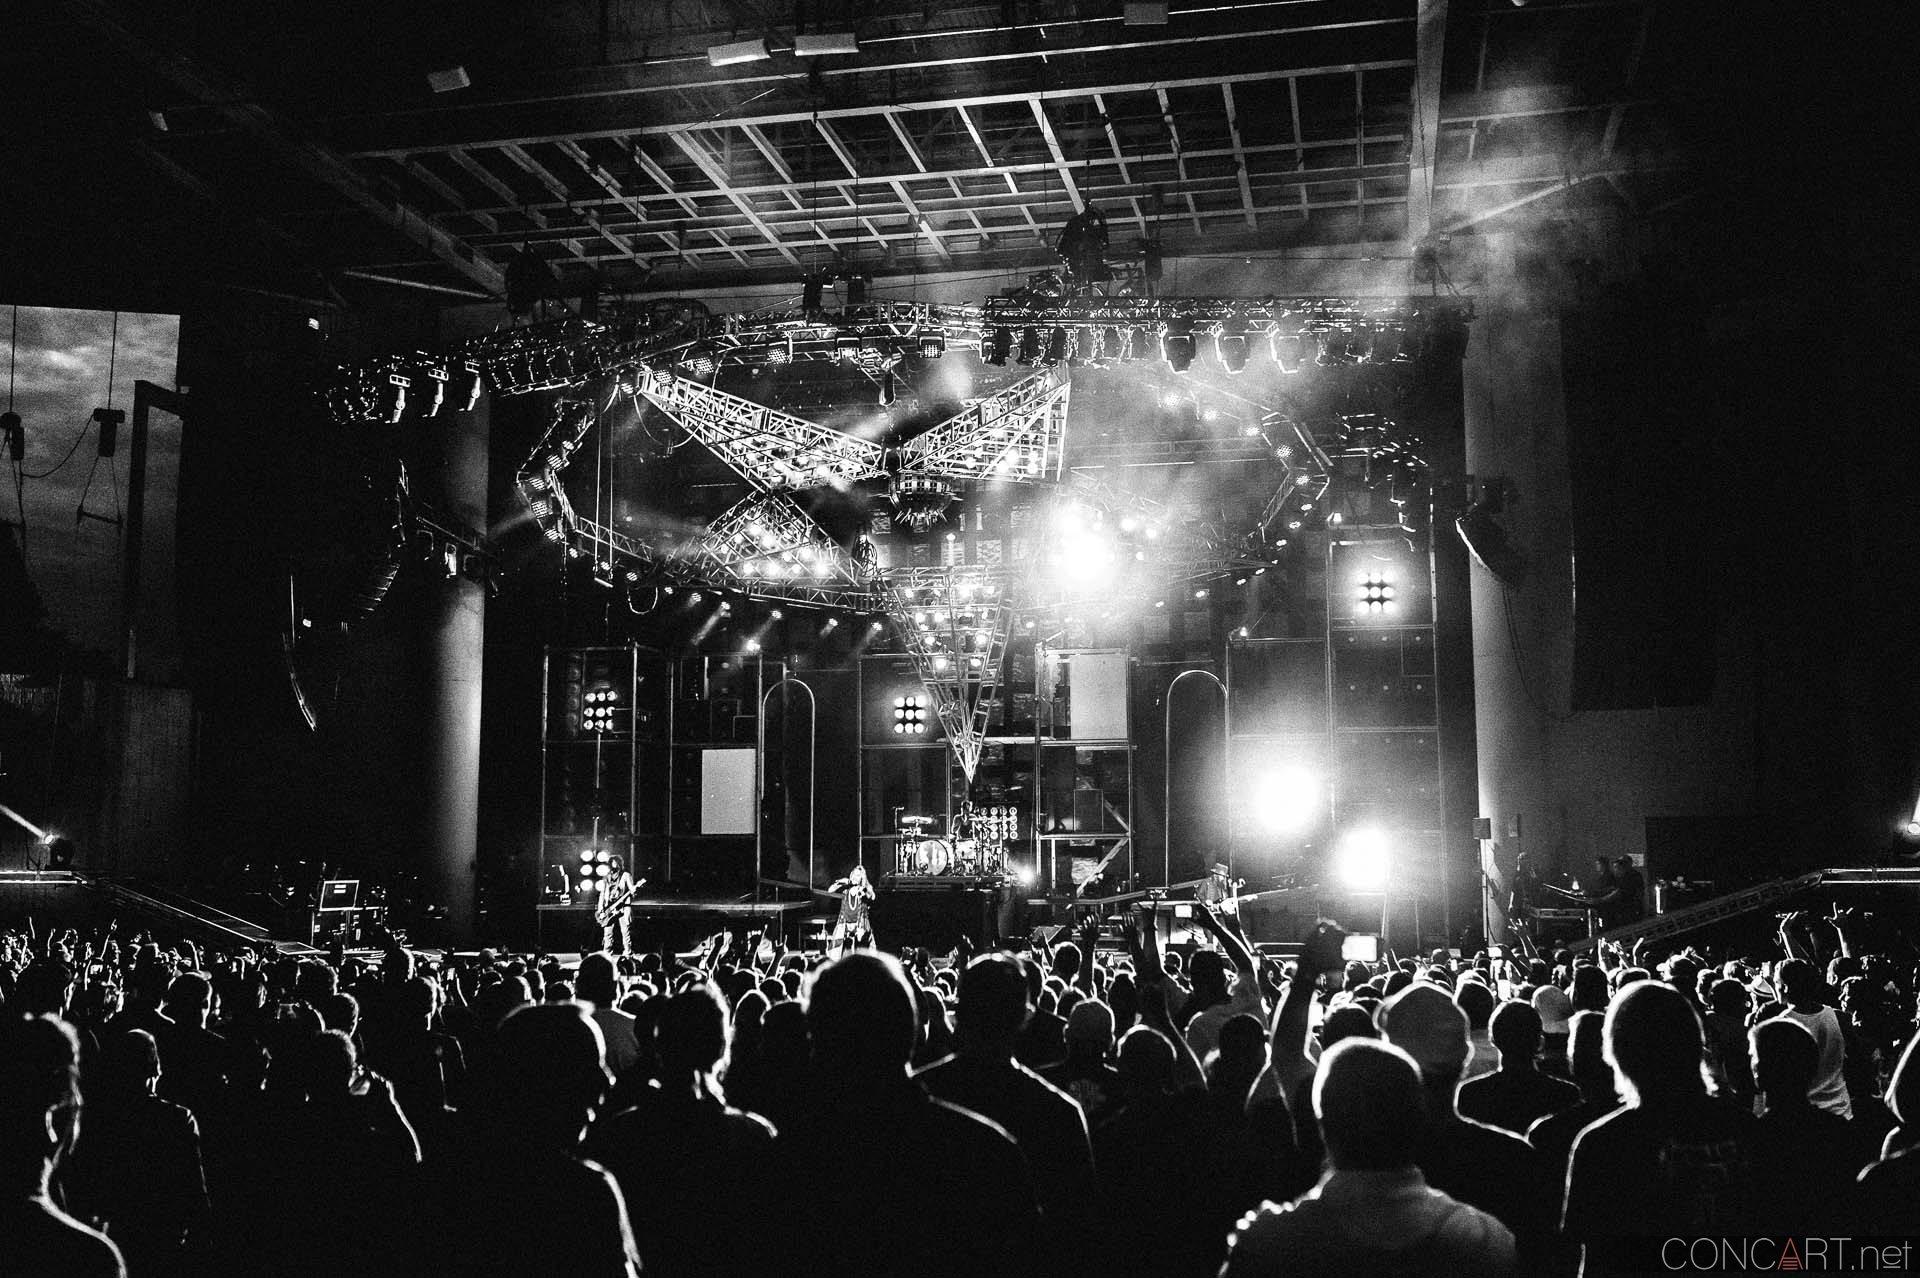 Mötley Crüe photo by Sean Molin 2